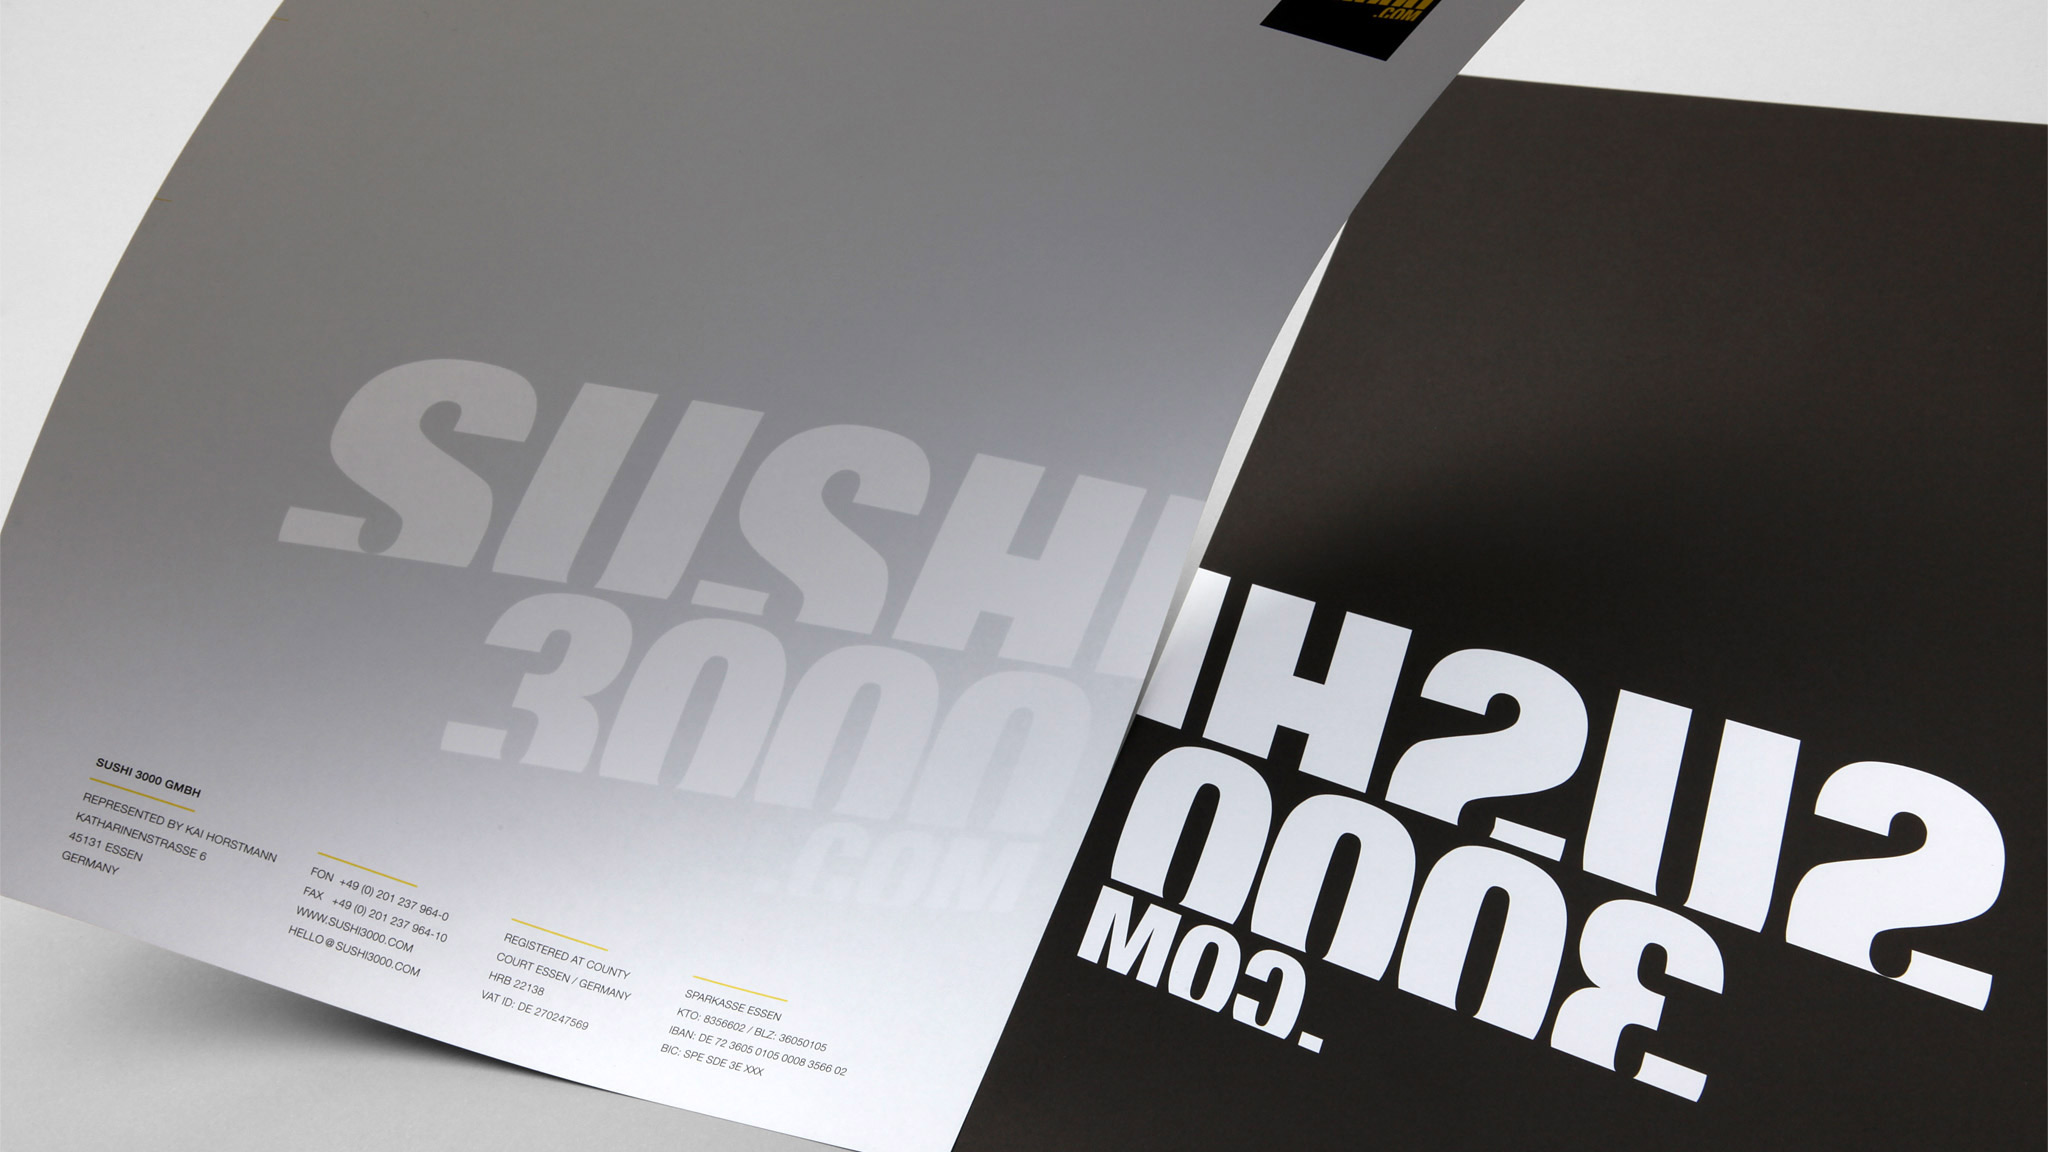 Hero-NikolasWrobel-V2A-nwyto-sushi3000_3